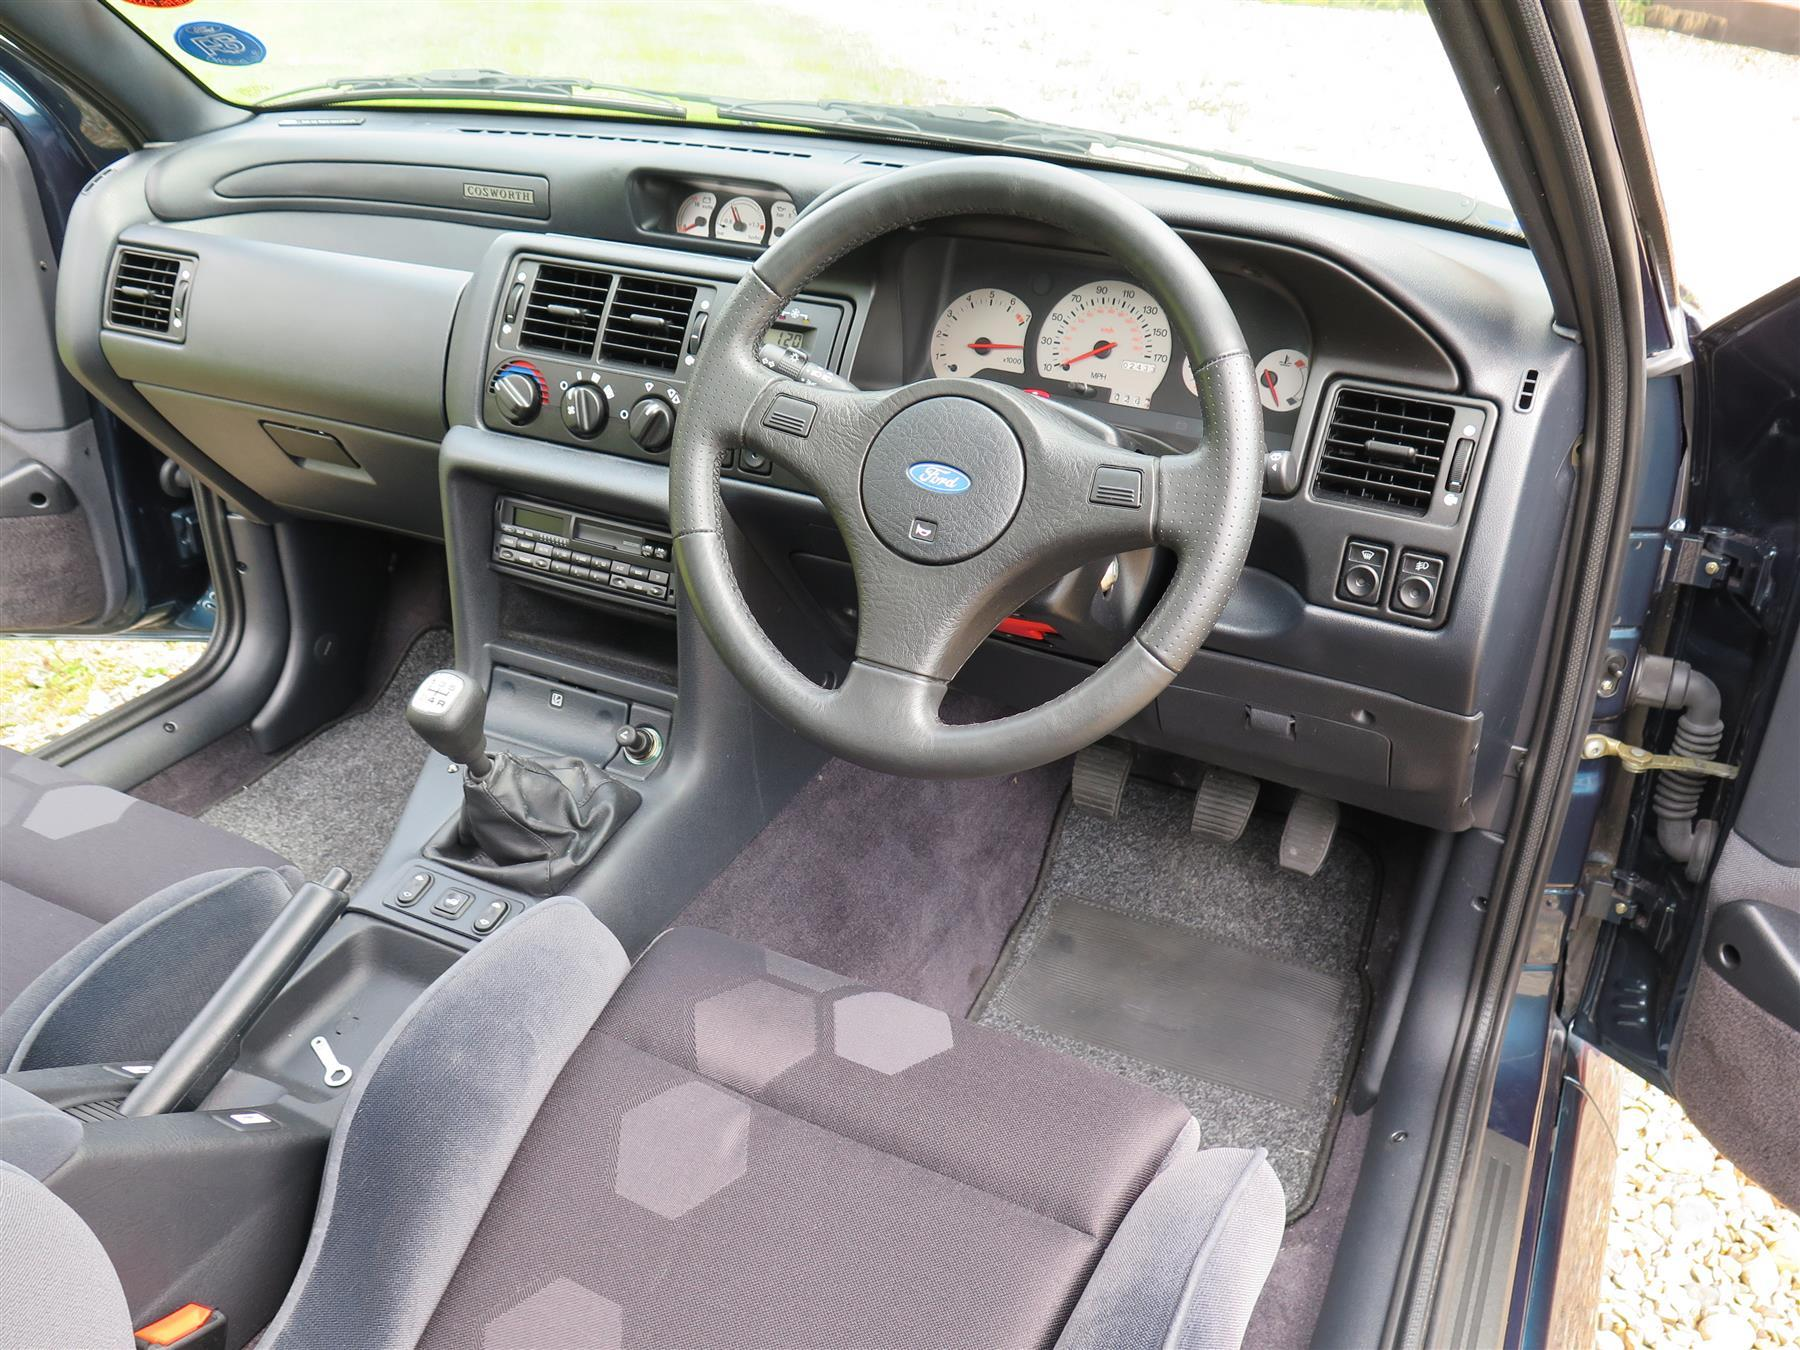 Ford Escort Cosworth - Ford Escort Cosworth